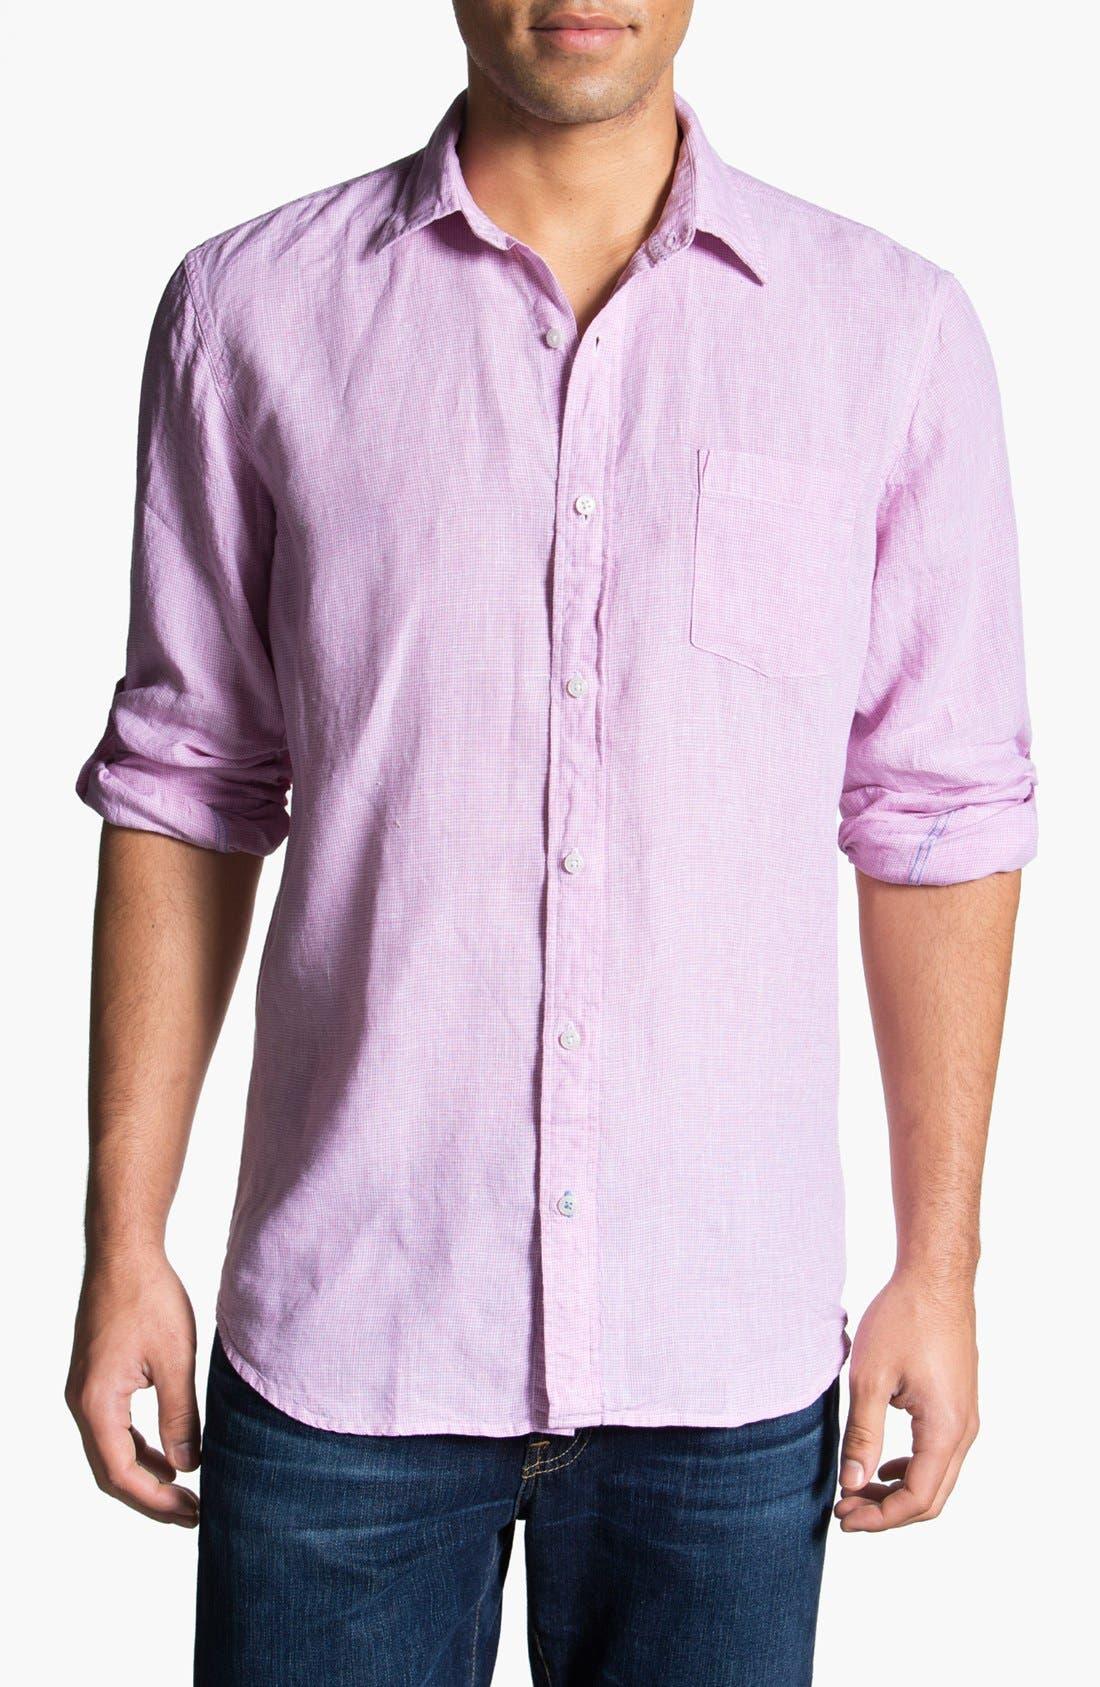 Alternate Image 1 Selected - Toscano Linen Sport Shirt (Big & Tall)